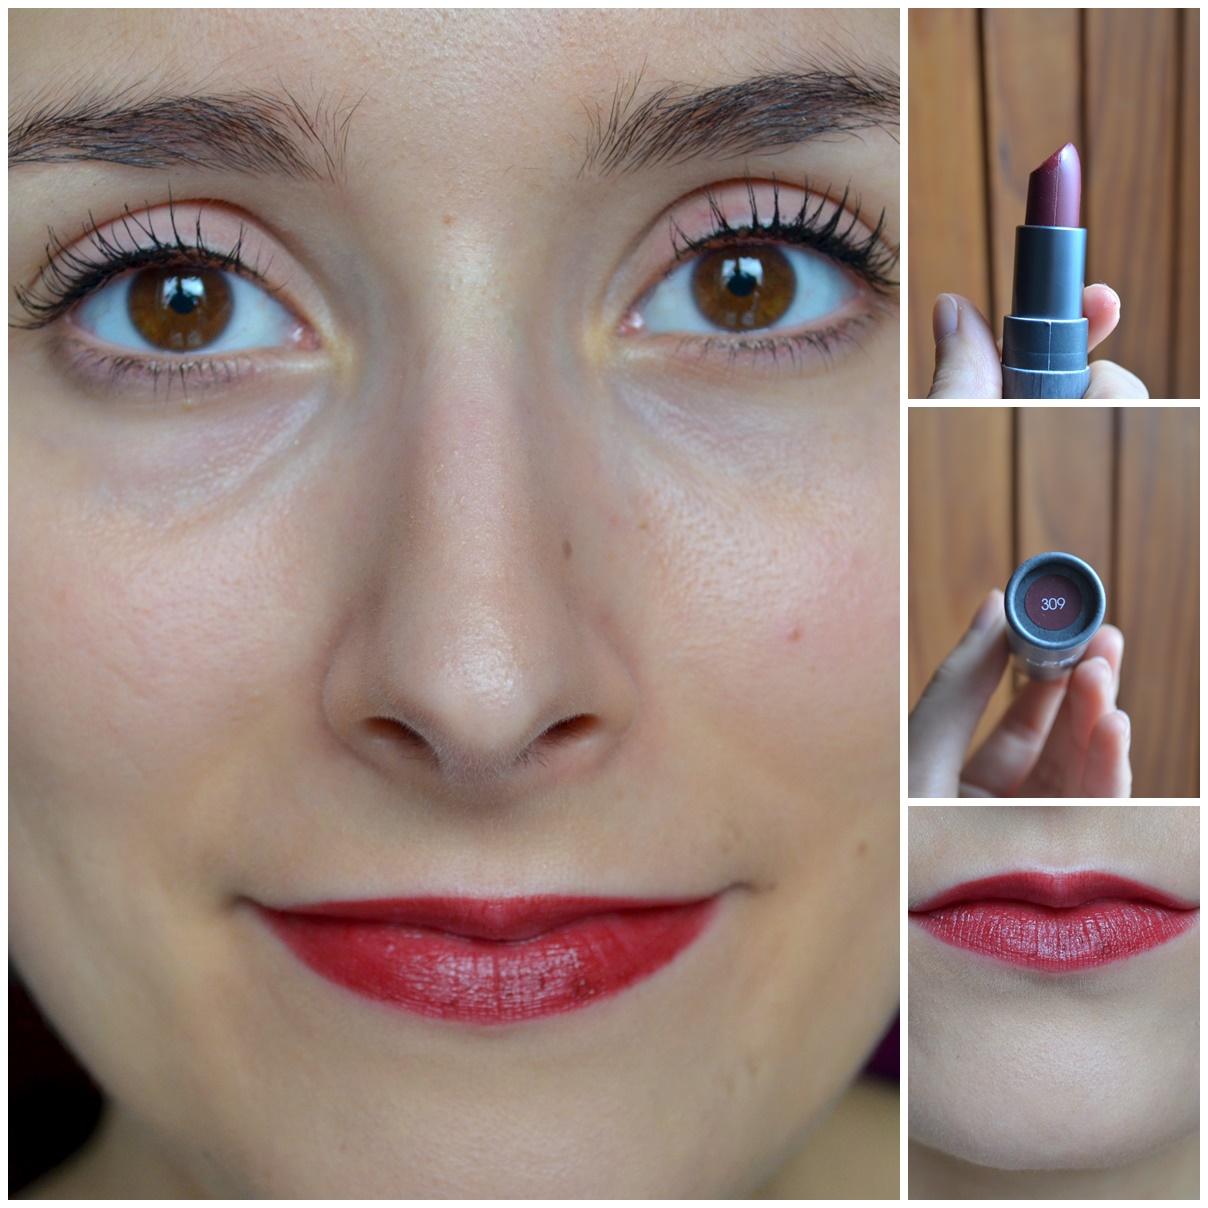 maquillage boho cosmetics rouge à lèvres teinte 309